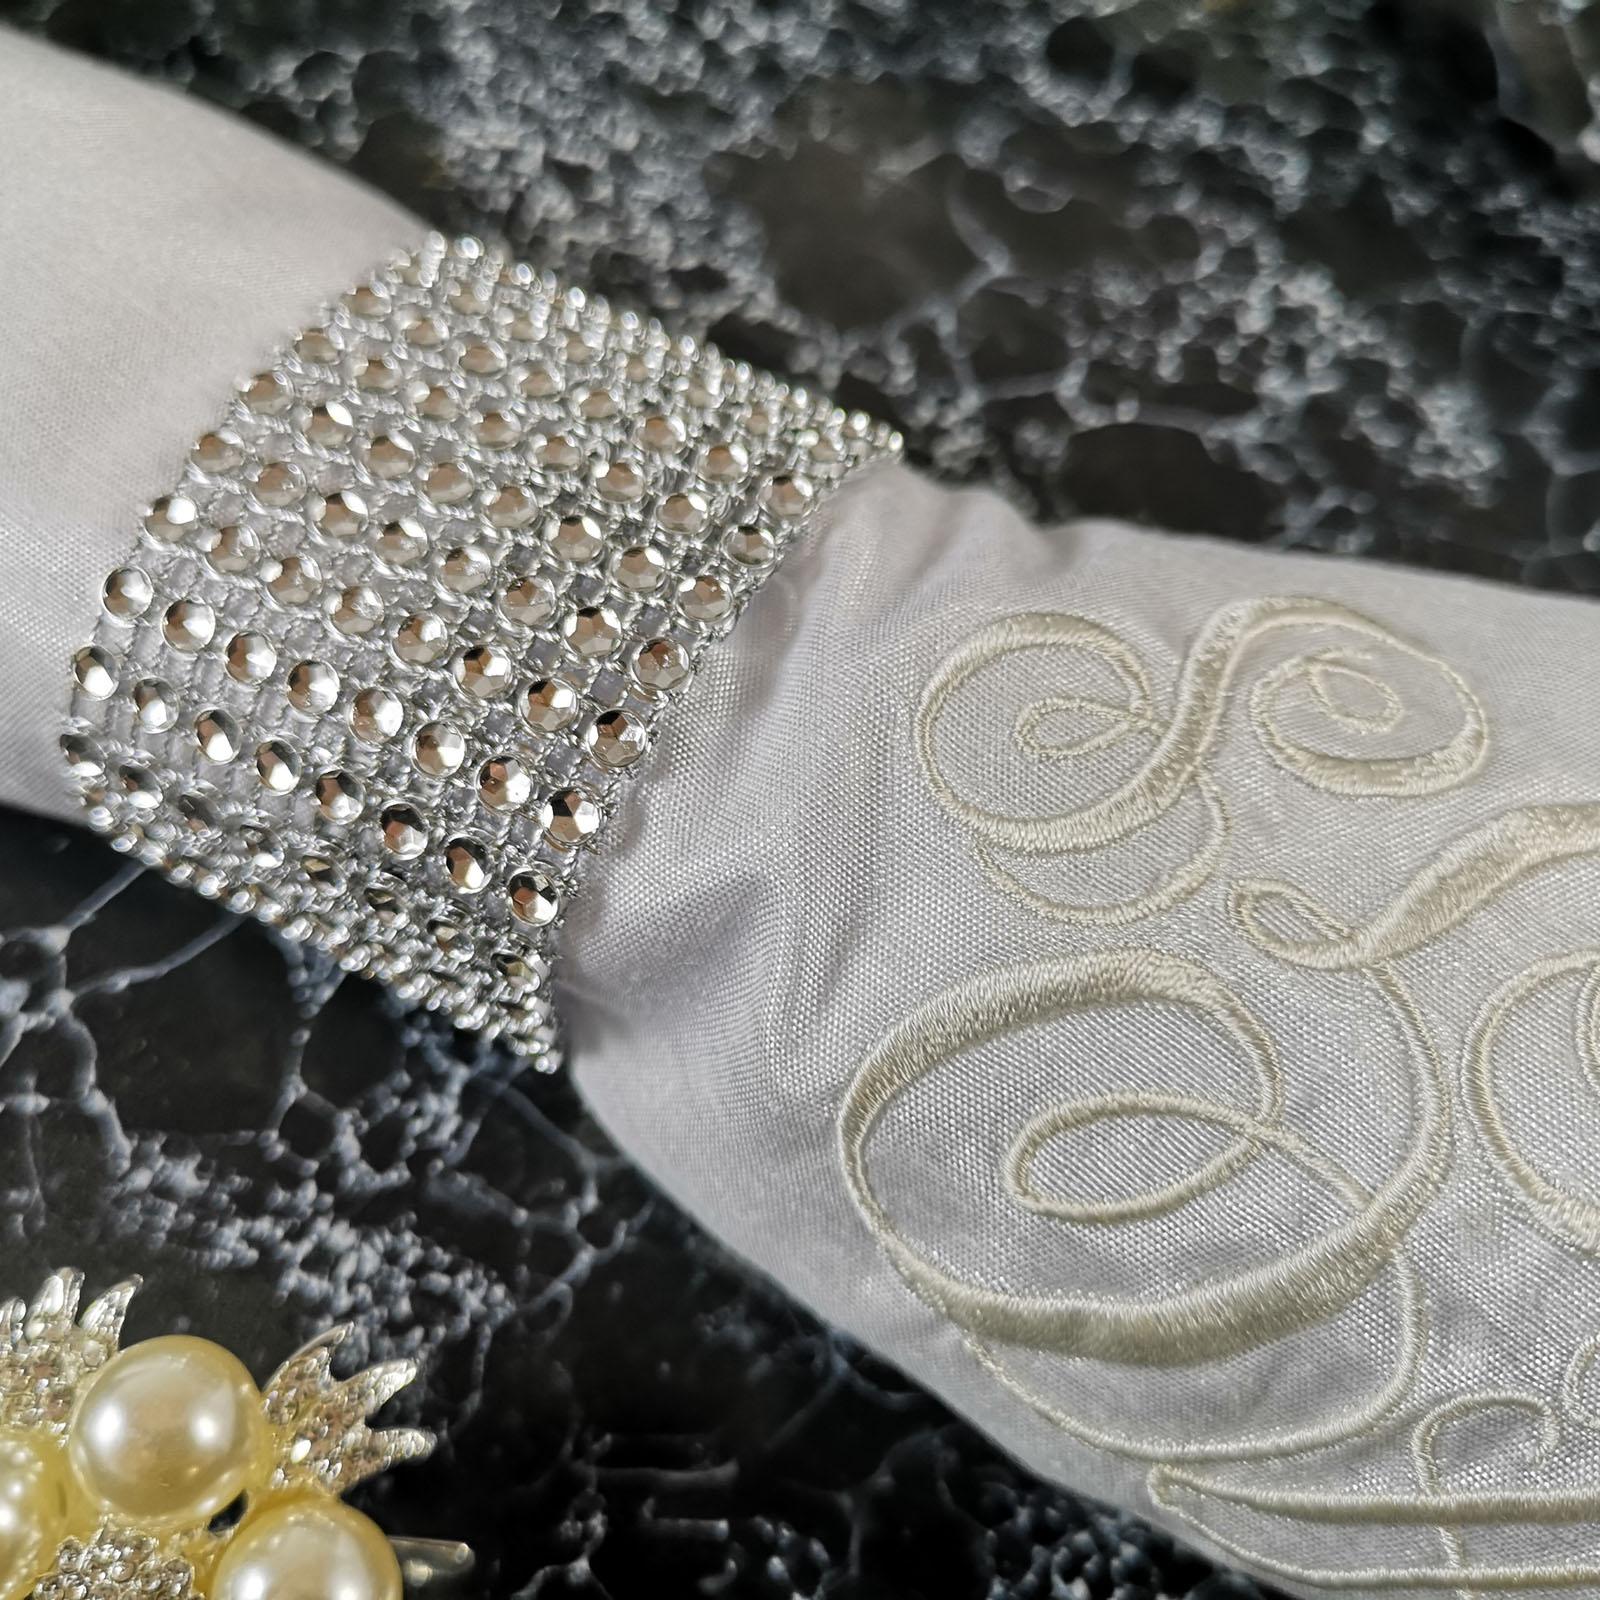 Monogram Napkin Set Of 100 Pieces Include Crystal Look Napkin Holder Your Custom Monogram Design Embroidered Onto Each One Luxury Wedding Invitations Handmade Invitations Wedding Favors